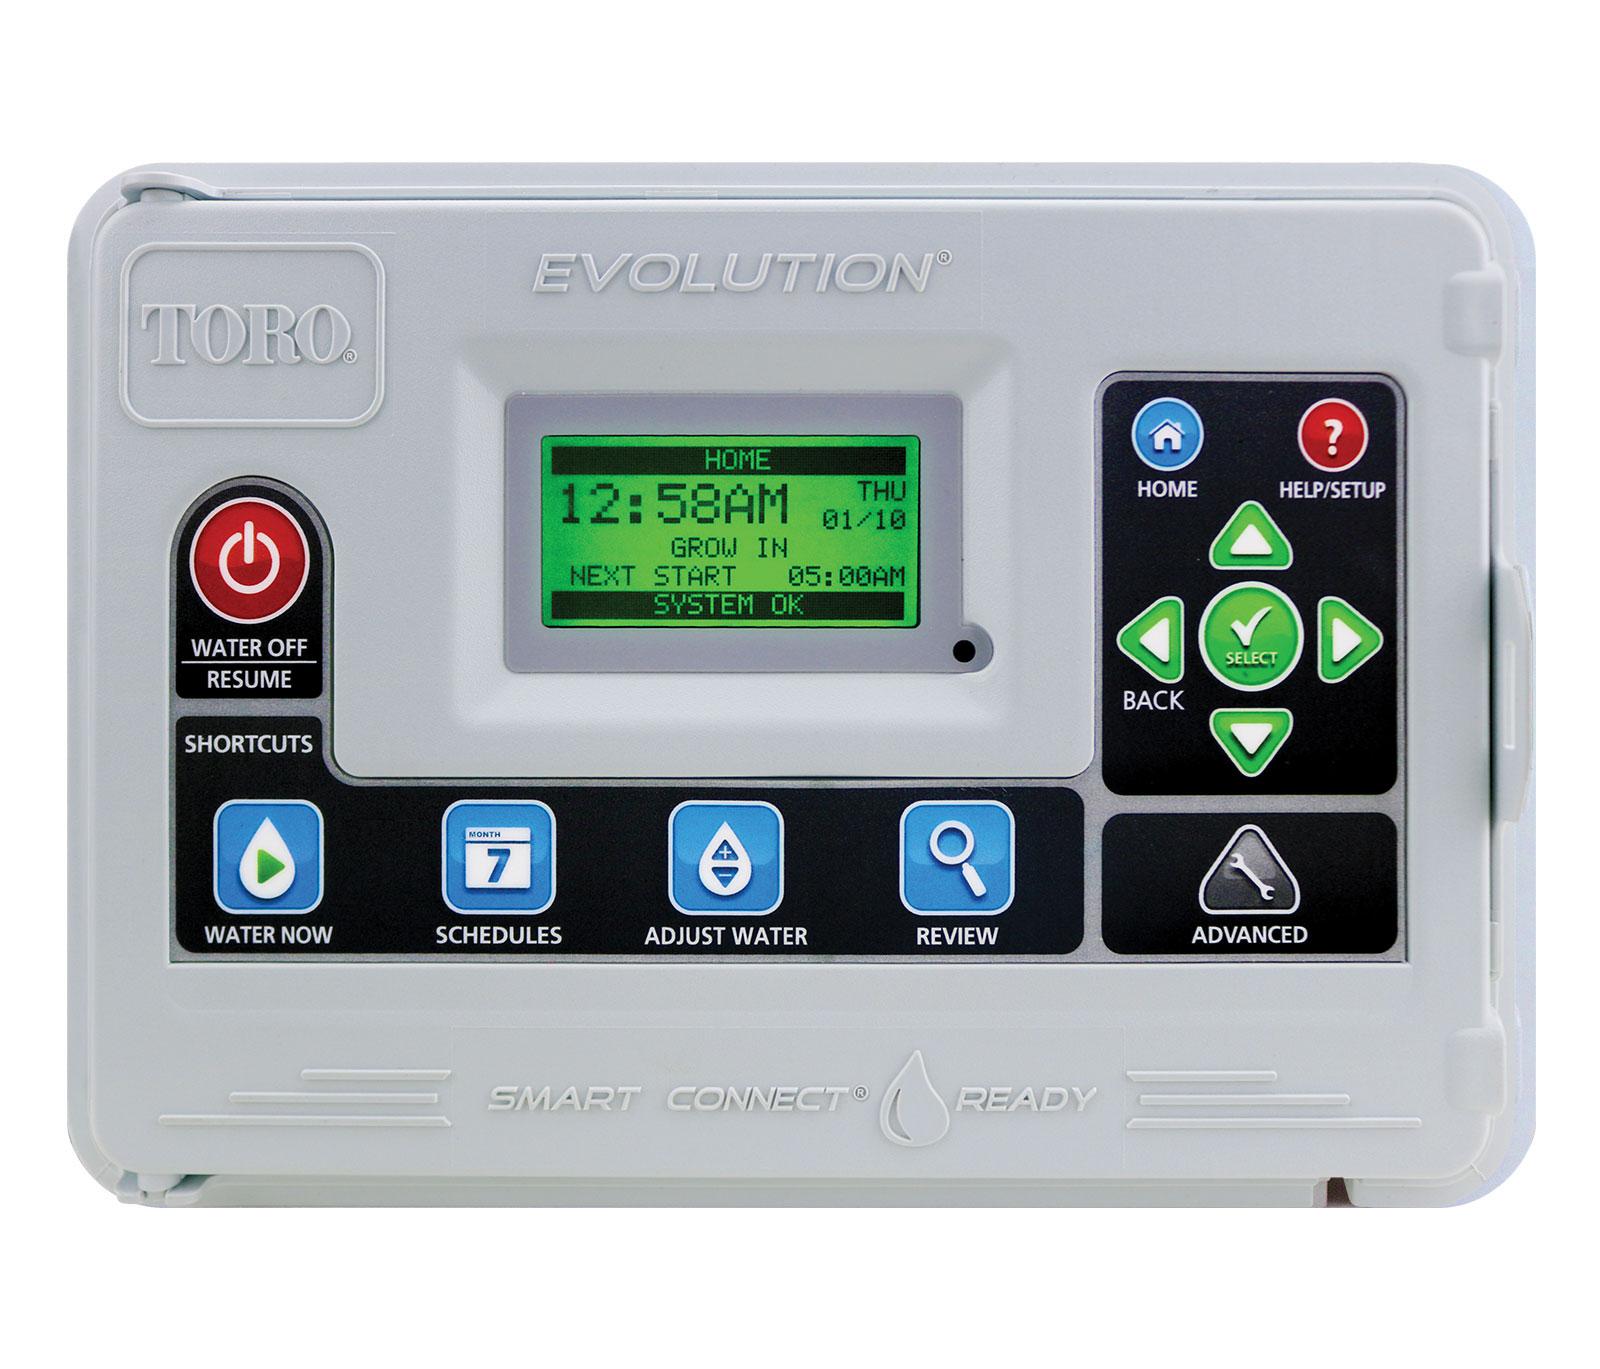 toro evolution series controller rh toro com scotts 1742 wiring diagram toro lawn mower wiring diagram [ 1600 x 1369 Pixel ]